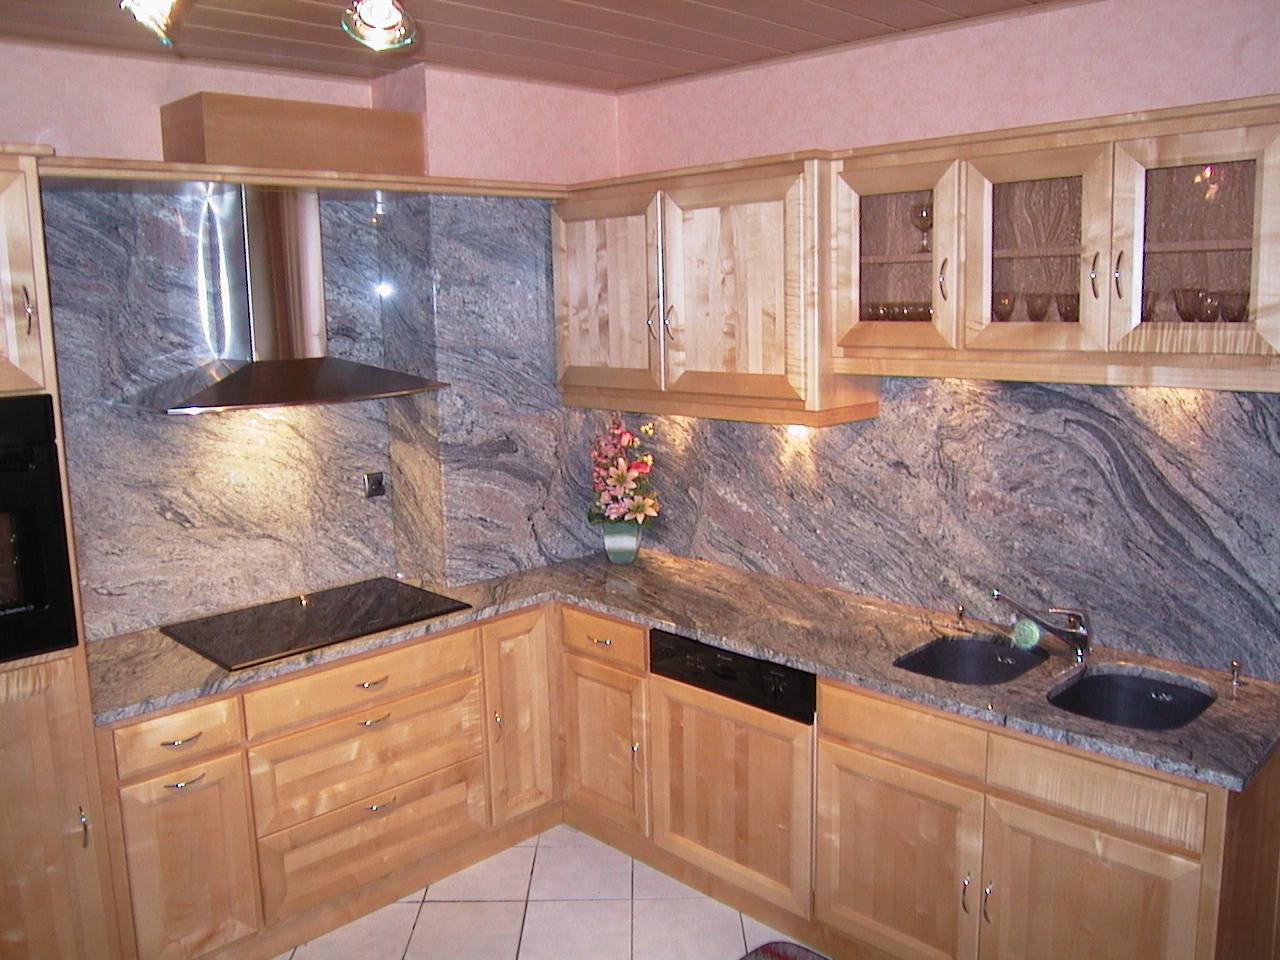 cuisine granit fabulous granit mascarello with cuisine granit amazing white granite colors for. Black Bedroom Furniture Sets. Home Design Ideas